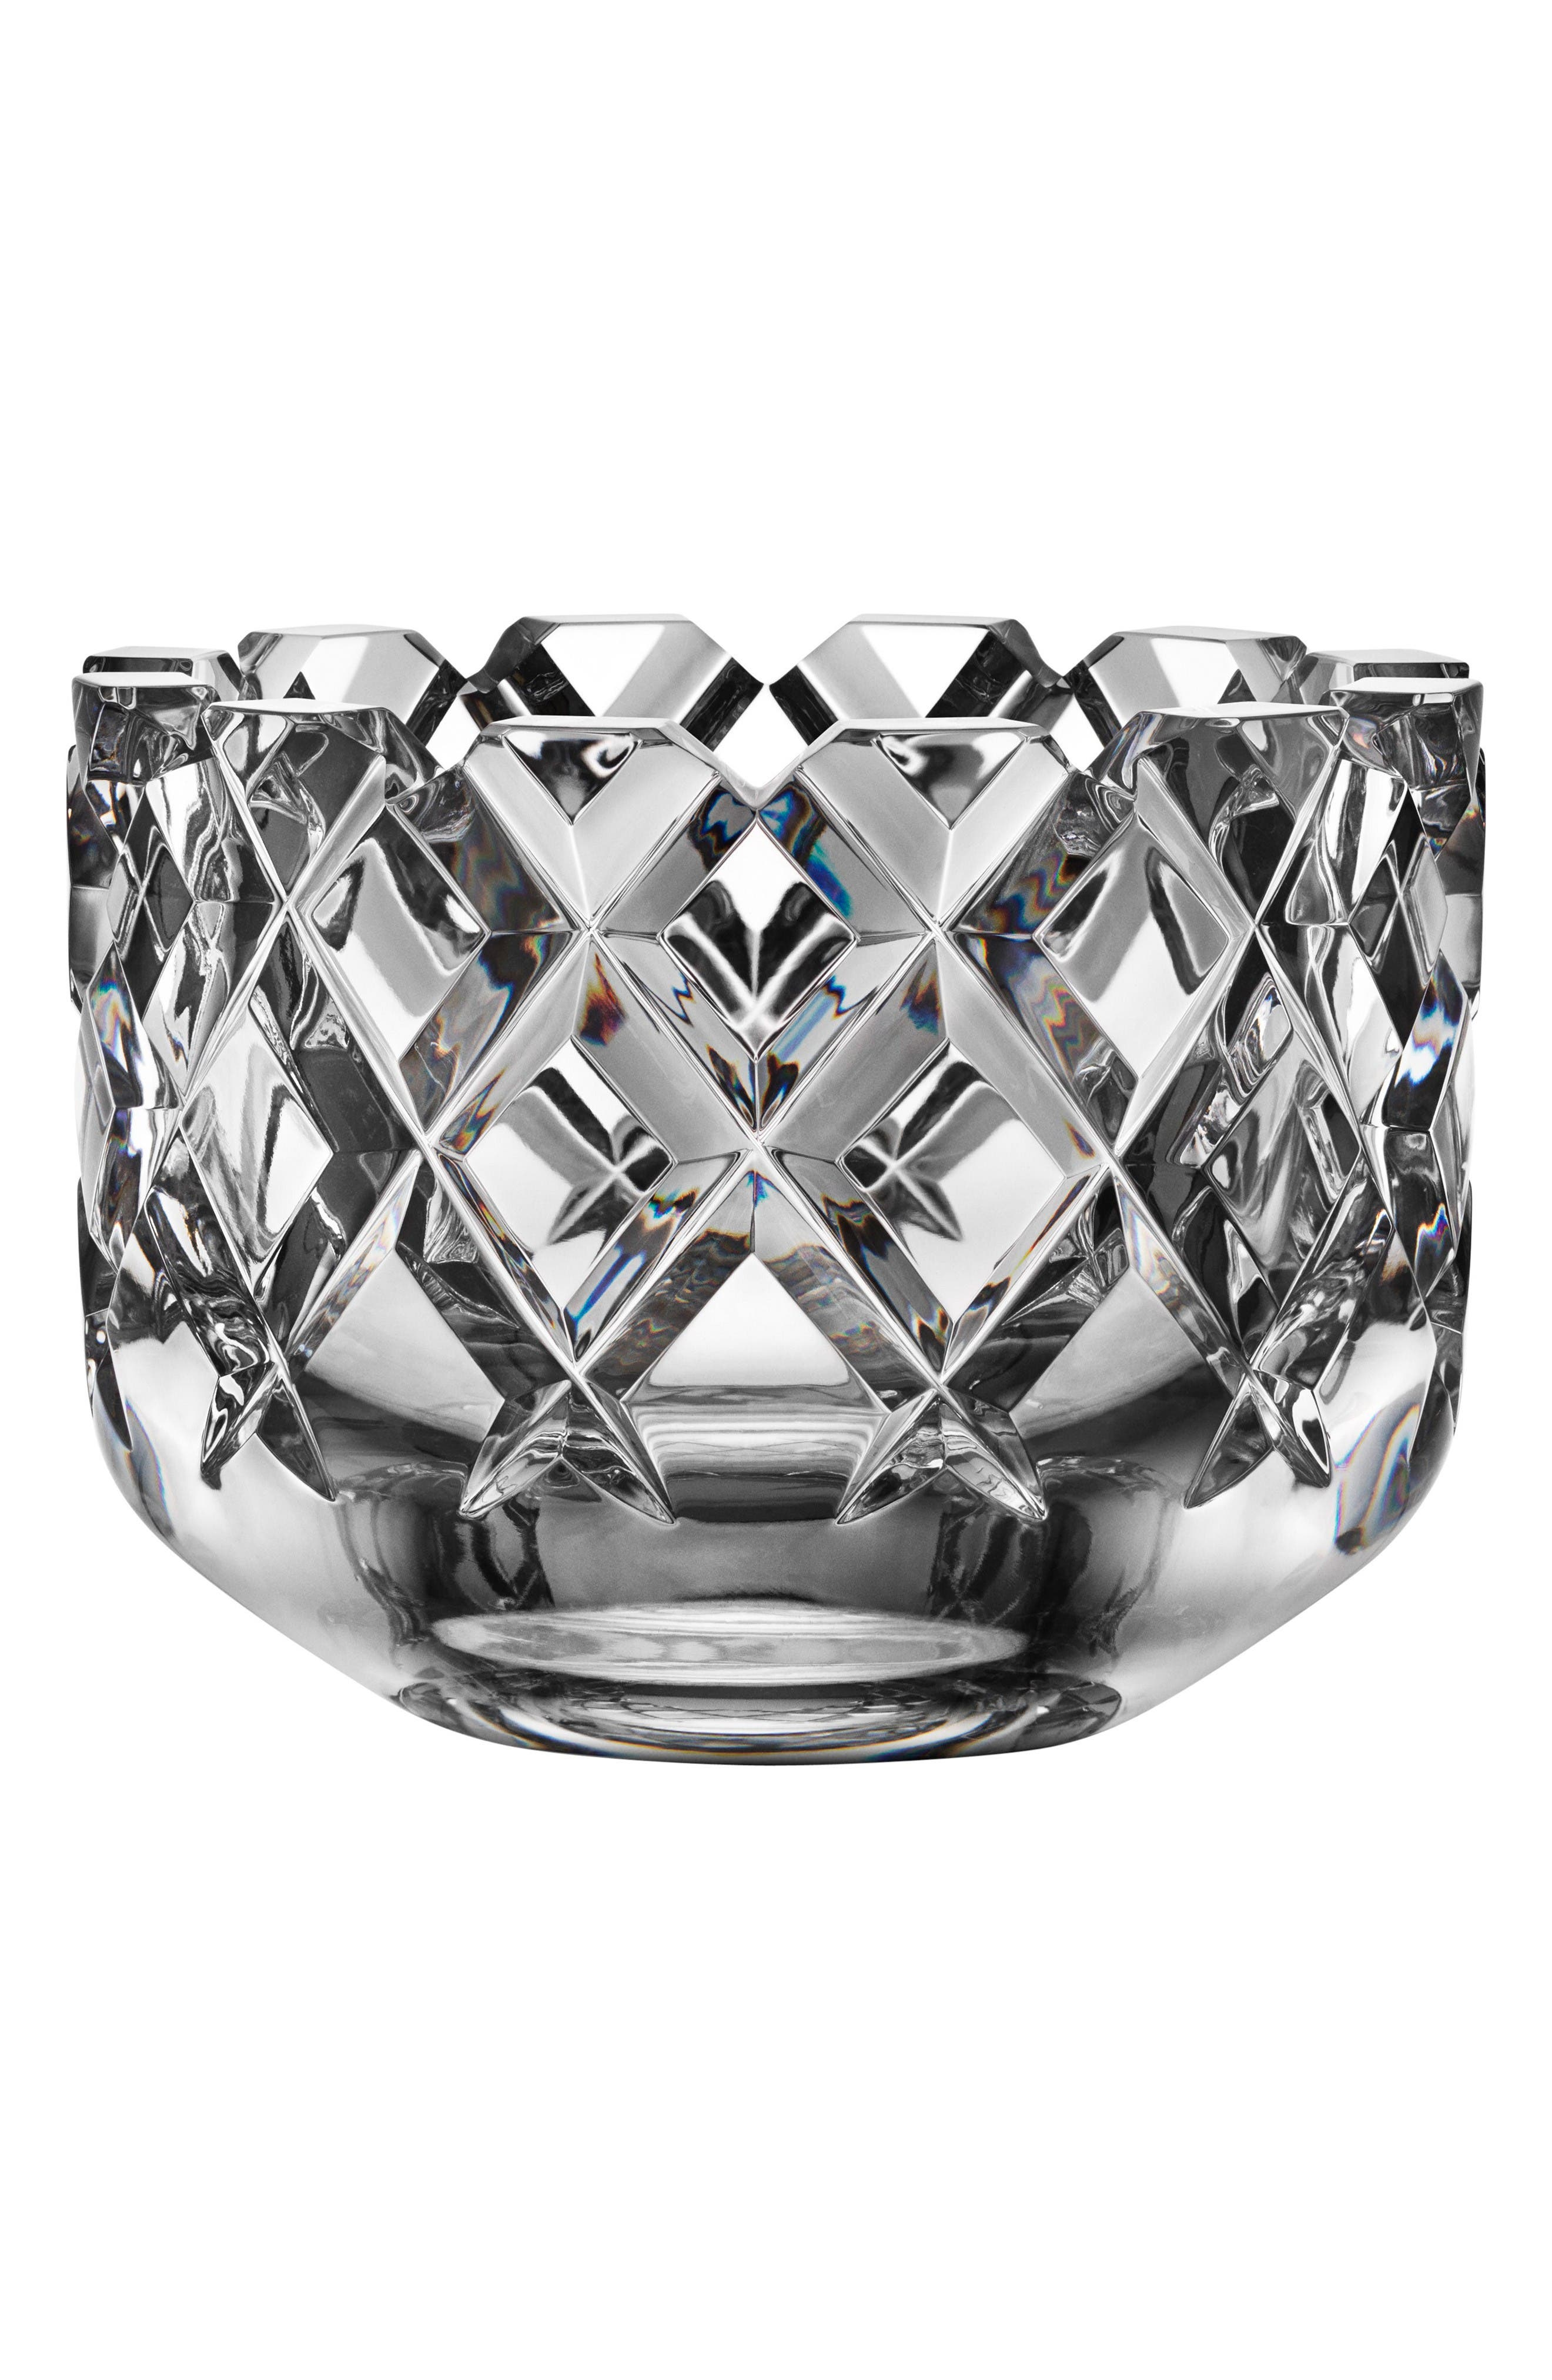 Main Image - Orrefors Sofiero Medium Crystal Bowl